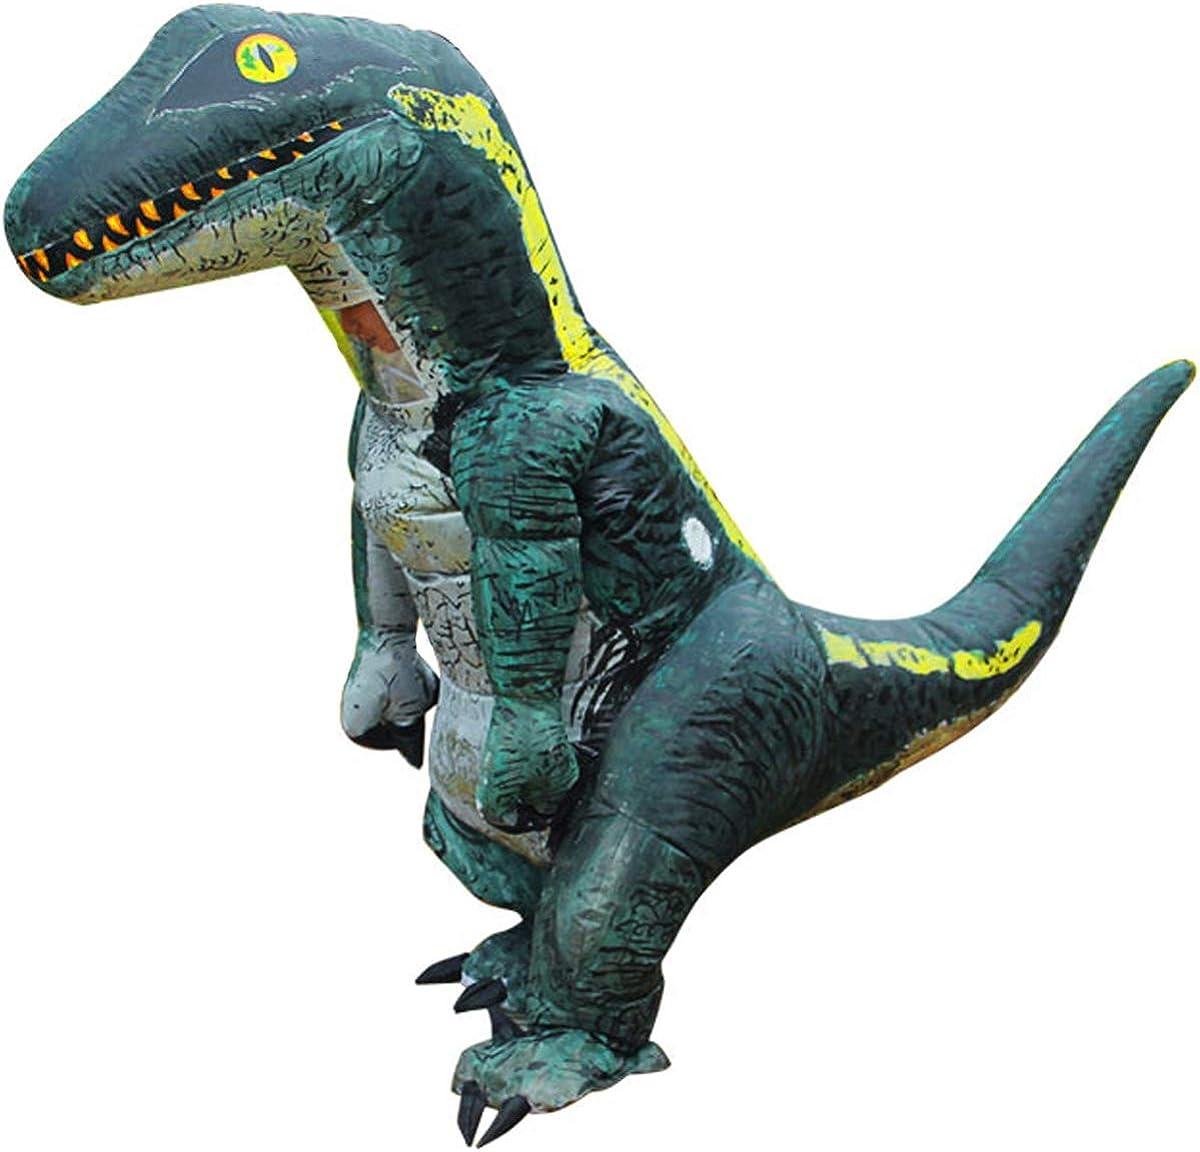 Jurassic World Adult Inflatable Velociraptor Dinosaur Costume